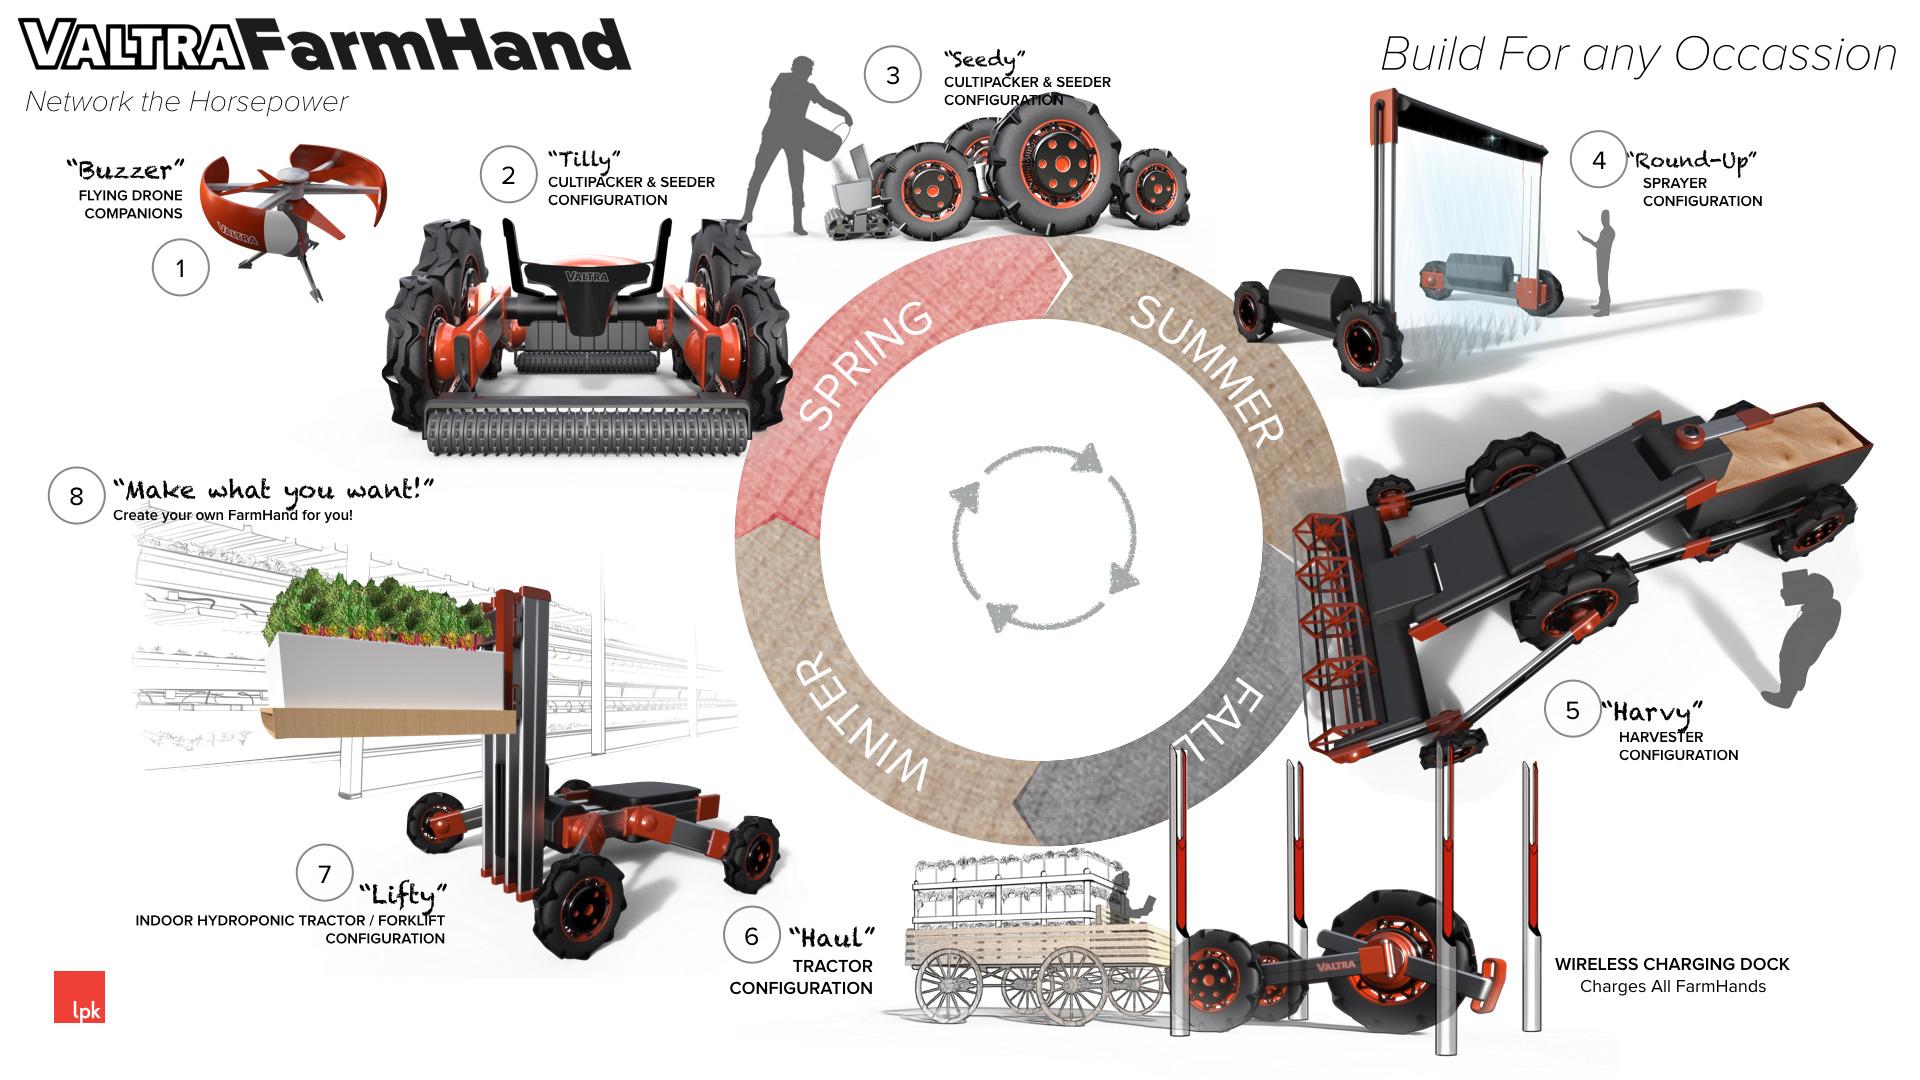 3-LPK_Valtra-FarmHand-2040-Tractor-Concept_Daniel-Yee.mp4.003-1